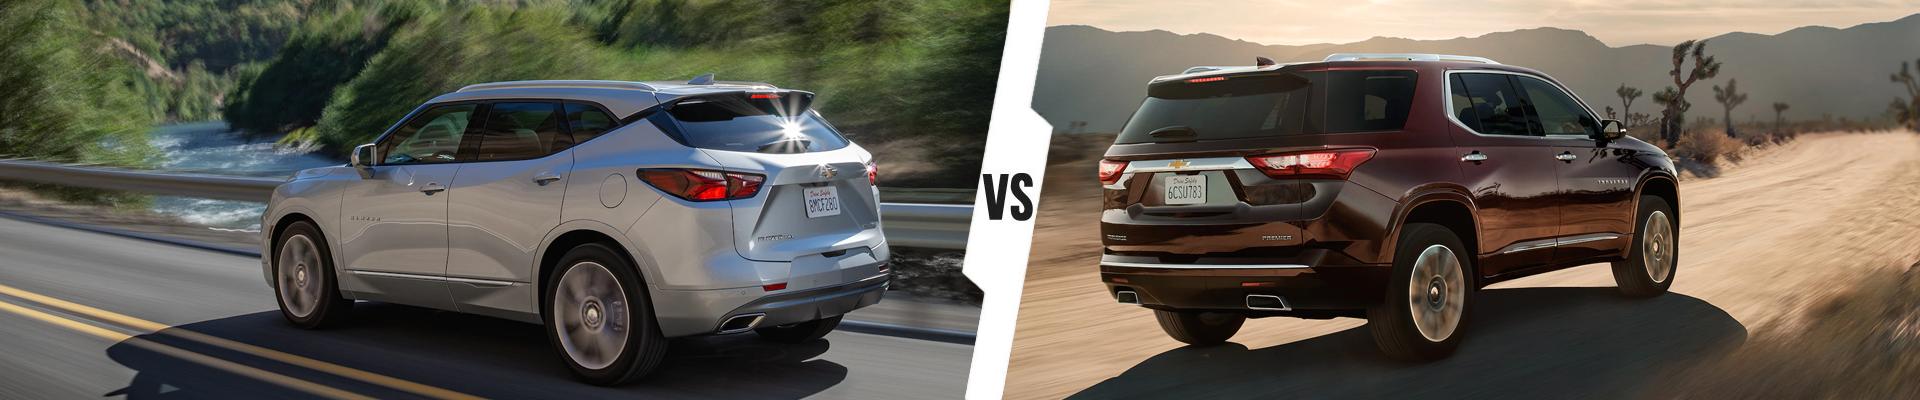 Chevrolet SUV Comparison: 2020 Chevrolet Blazer Versus 2020 Chevrolet Traverse